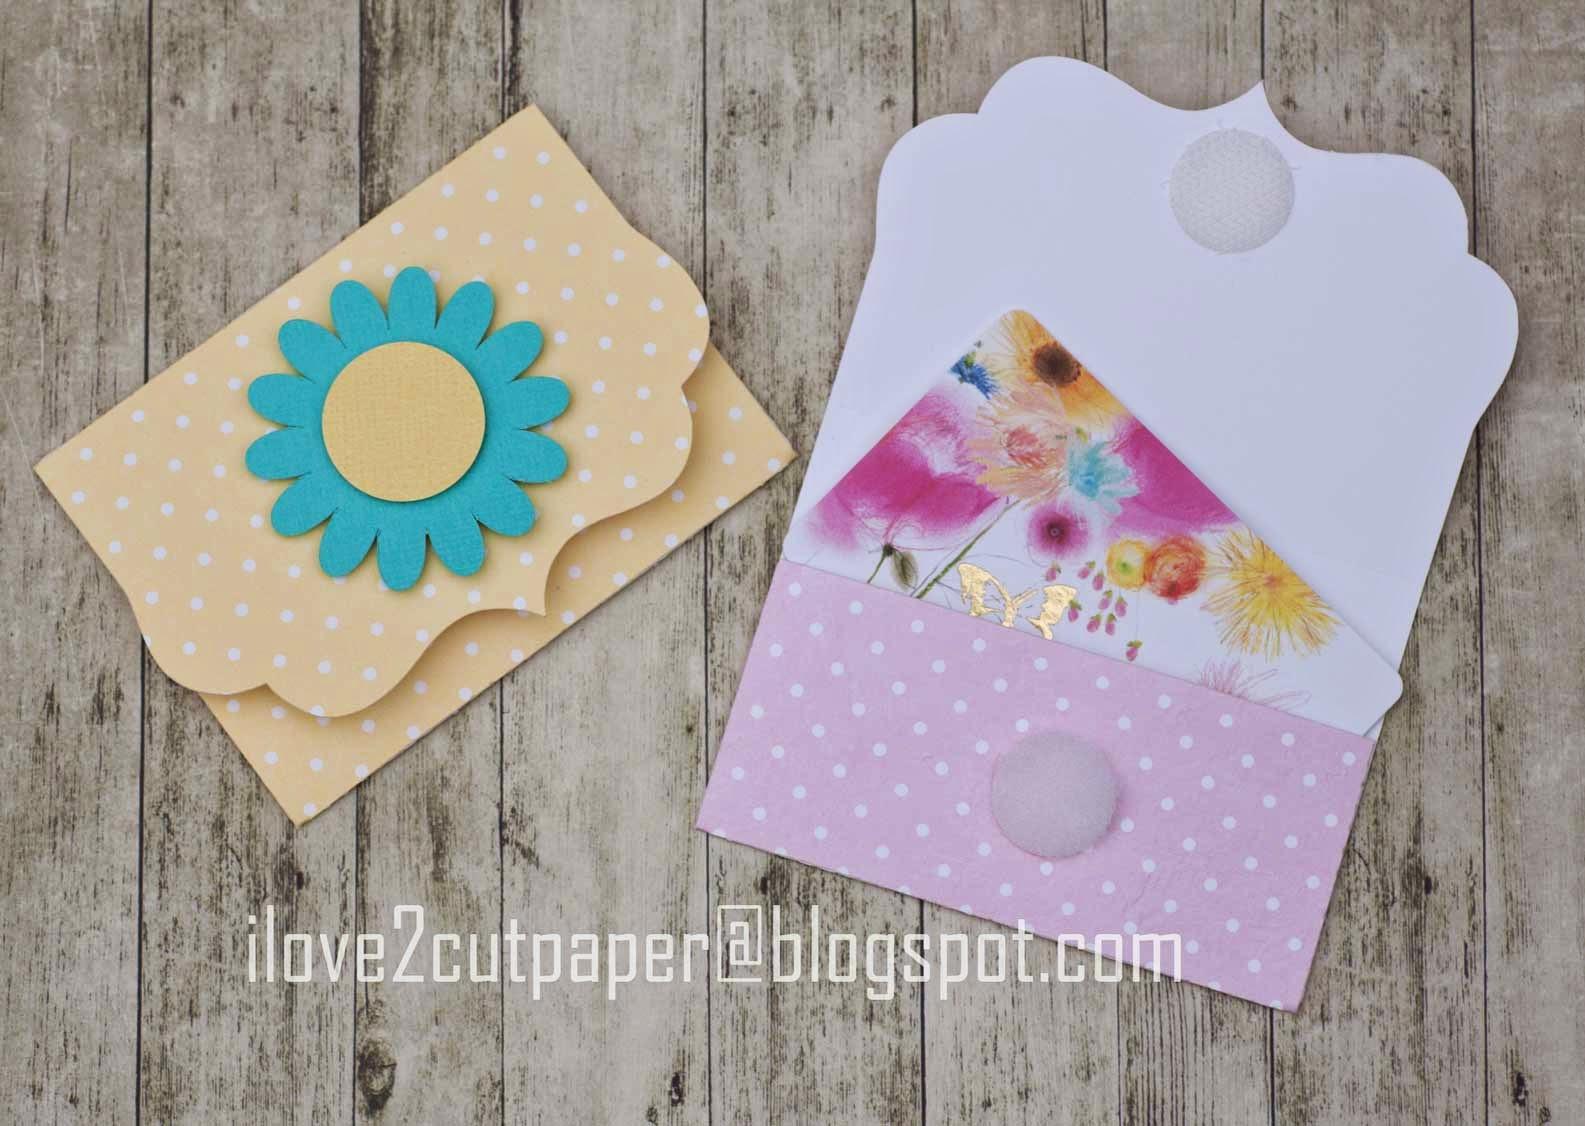 Gift Card cutting files